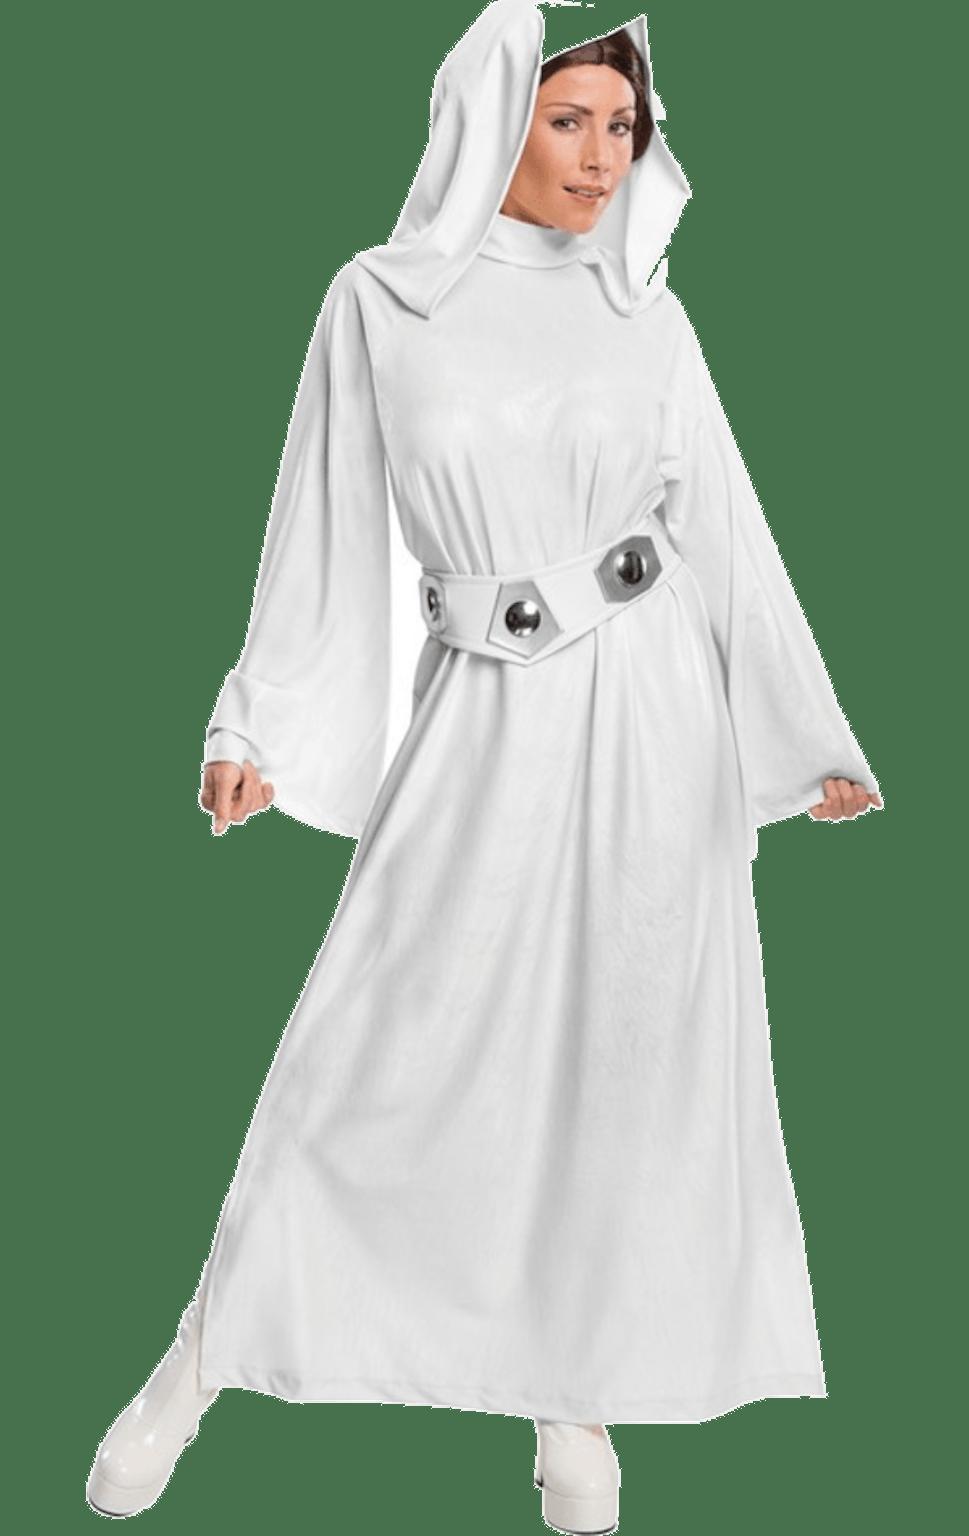 Adult Star Wars Princess Leia Costume Joke Co Uk